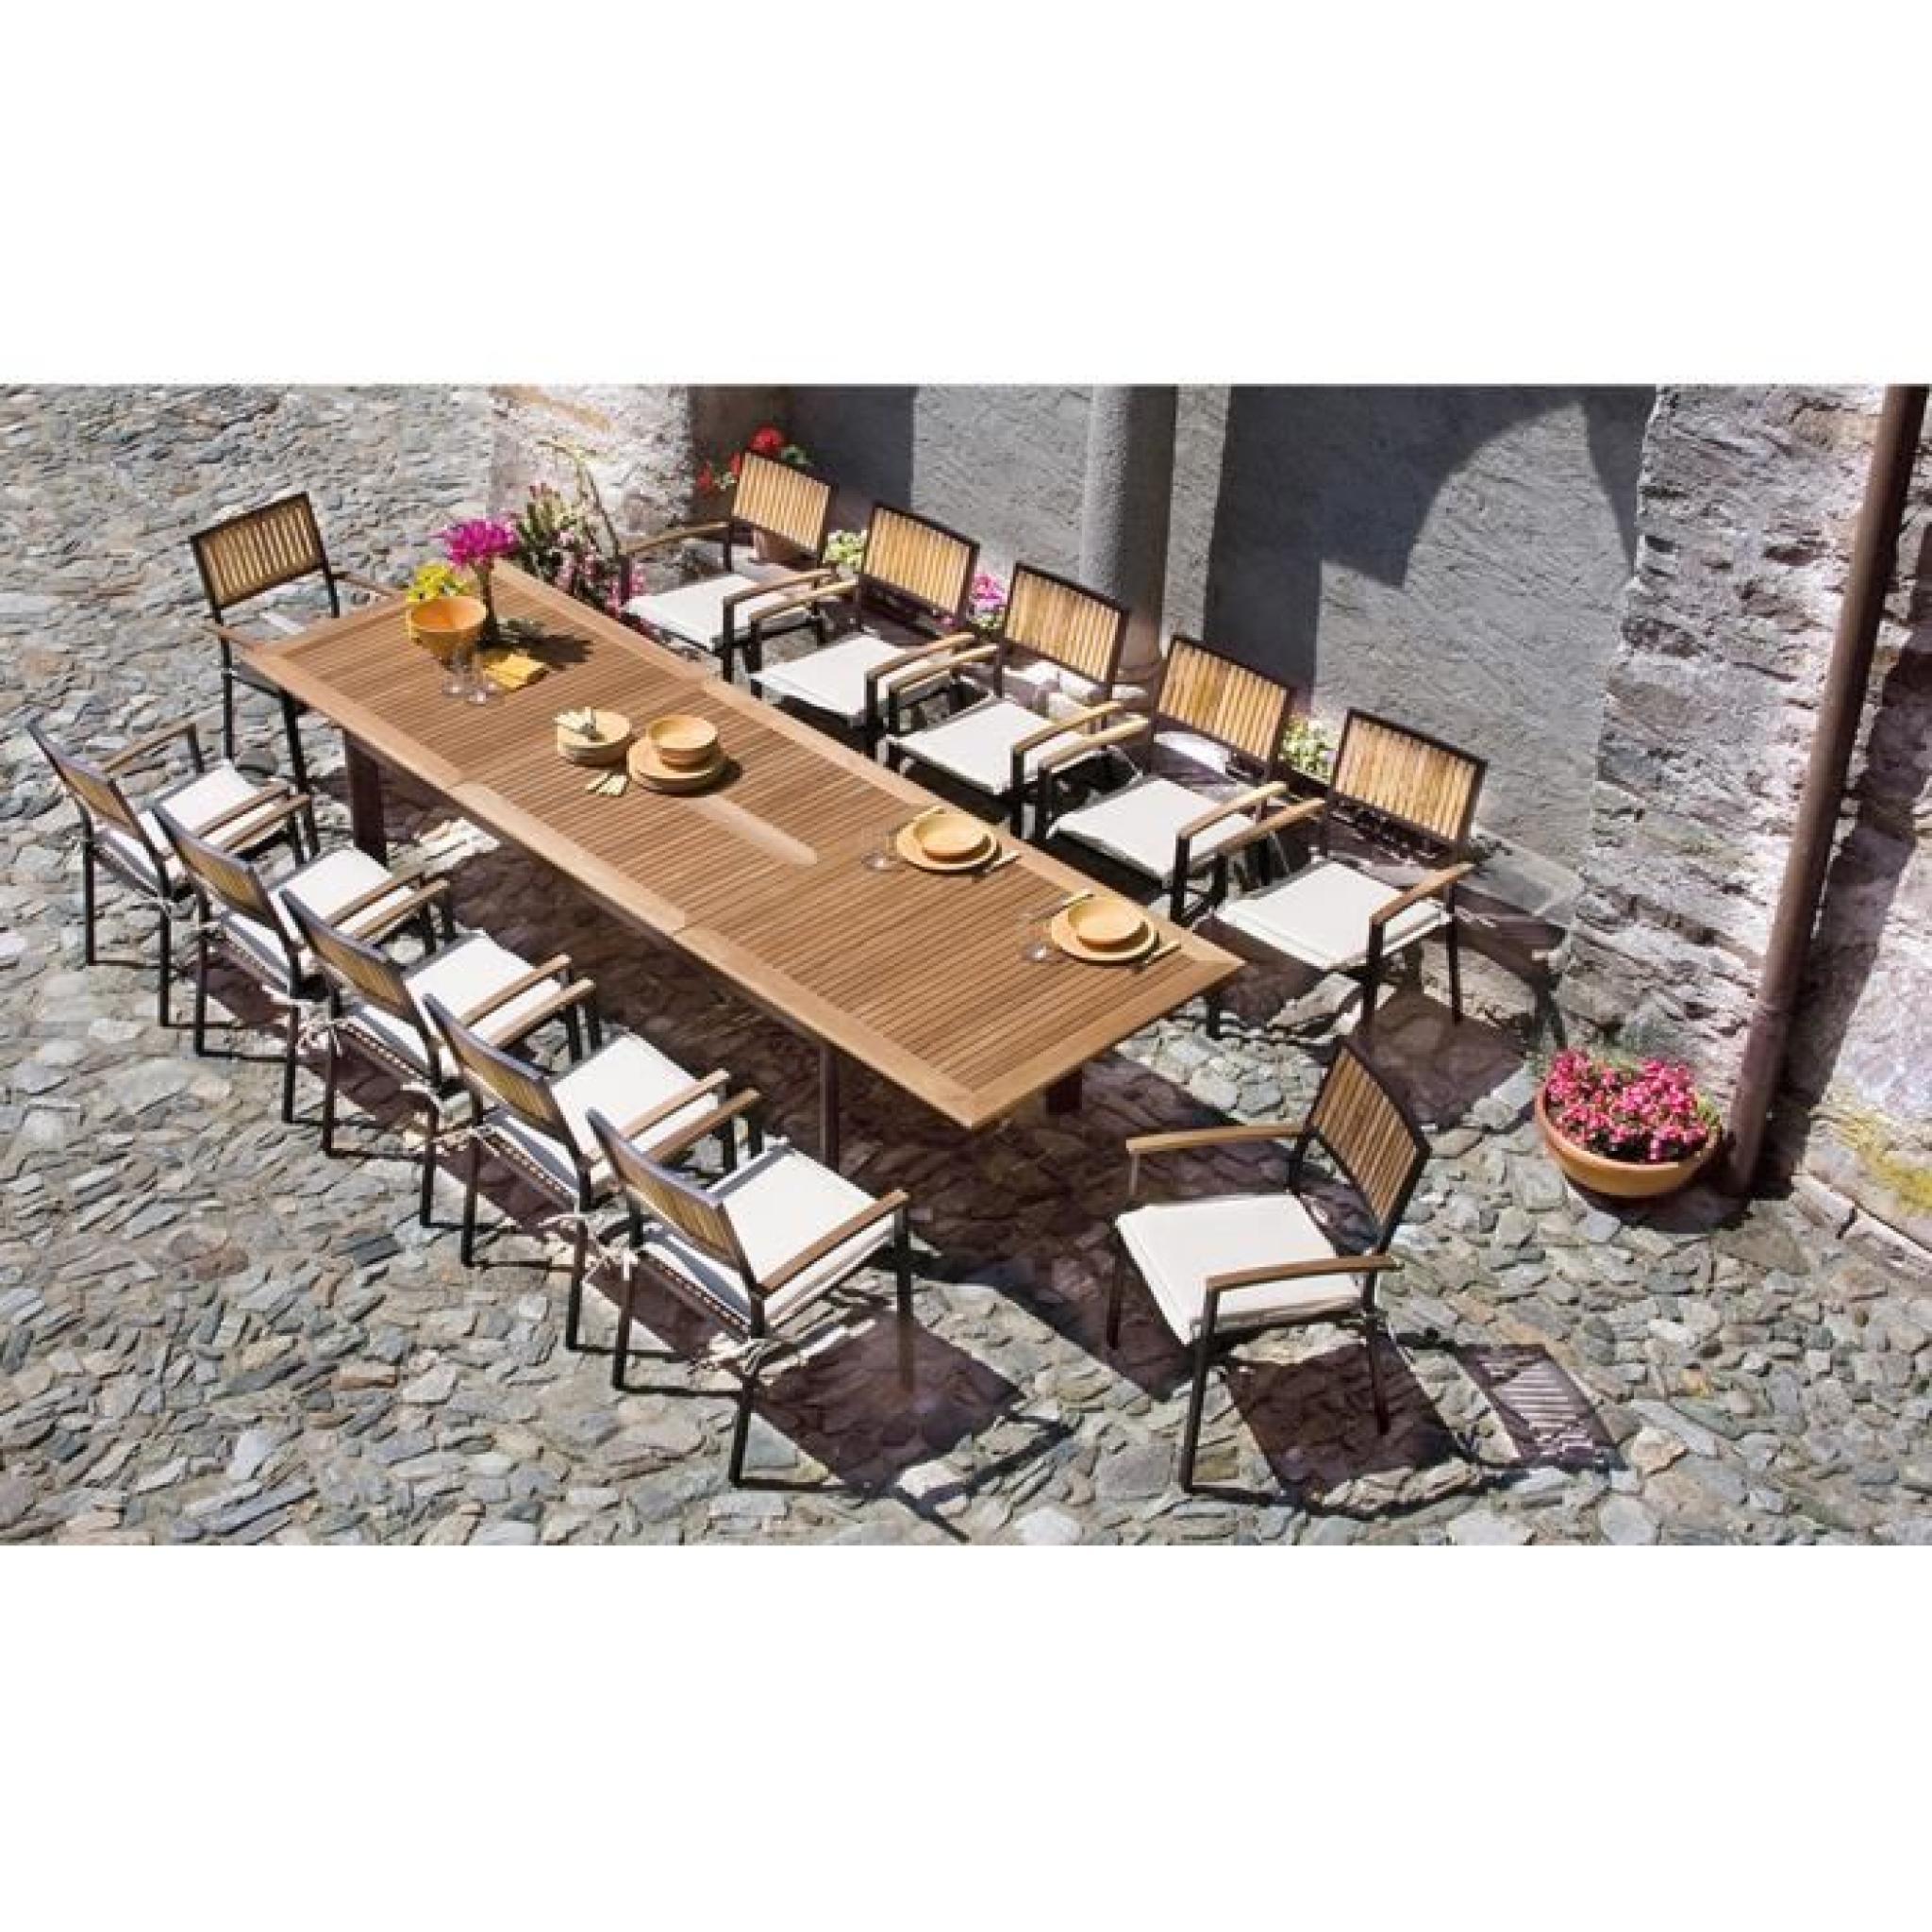 Table extensible de jardin en aluminium noir et bois teck - Table de jardin en bois pas cher ...